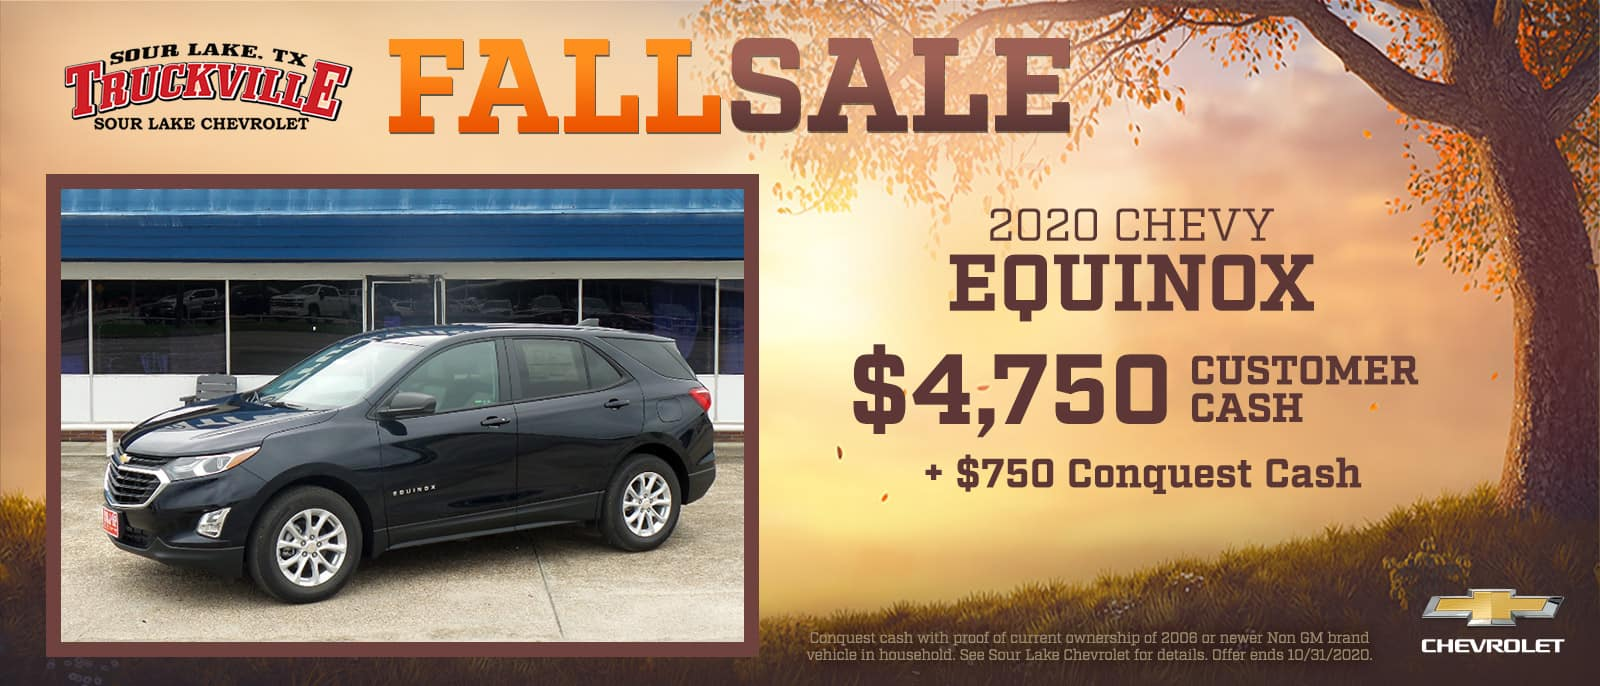 2020 Chevrolet Equinox Fall Sale Event | Sour Lake, TX